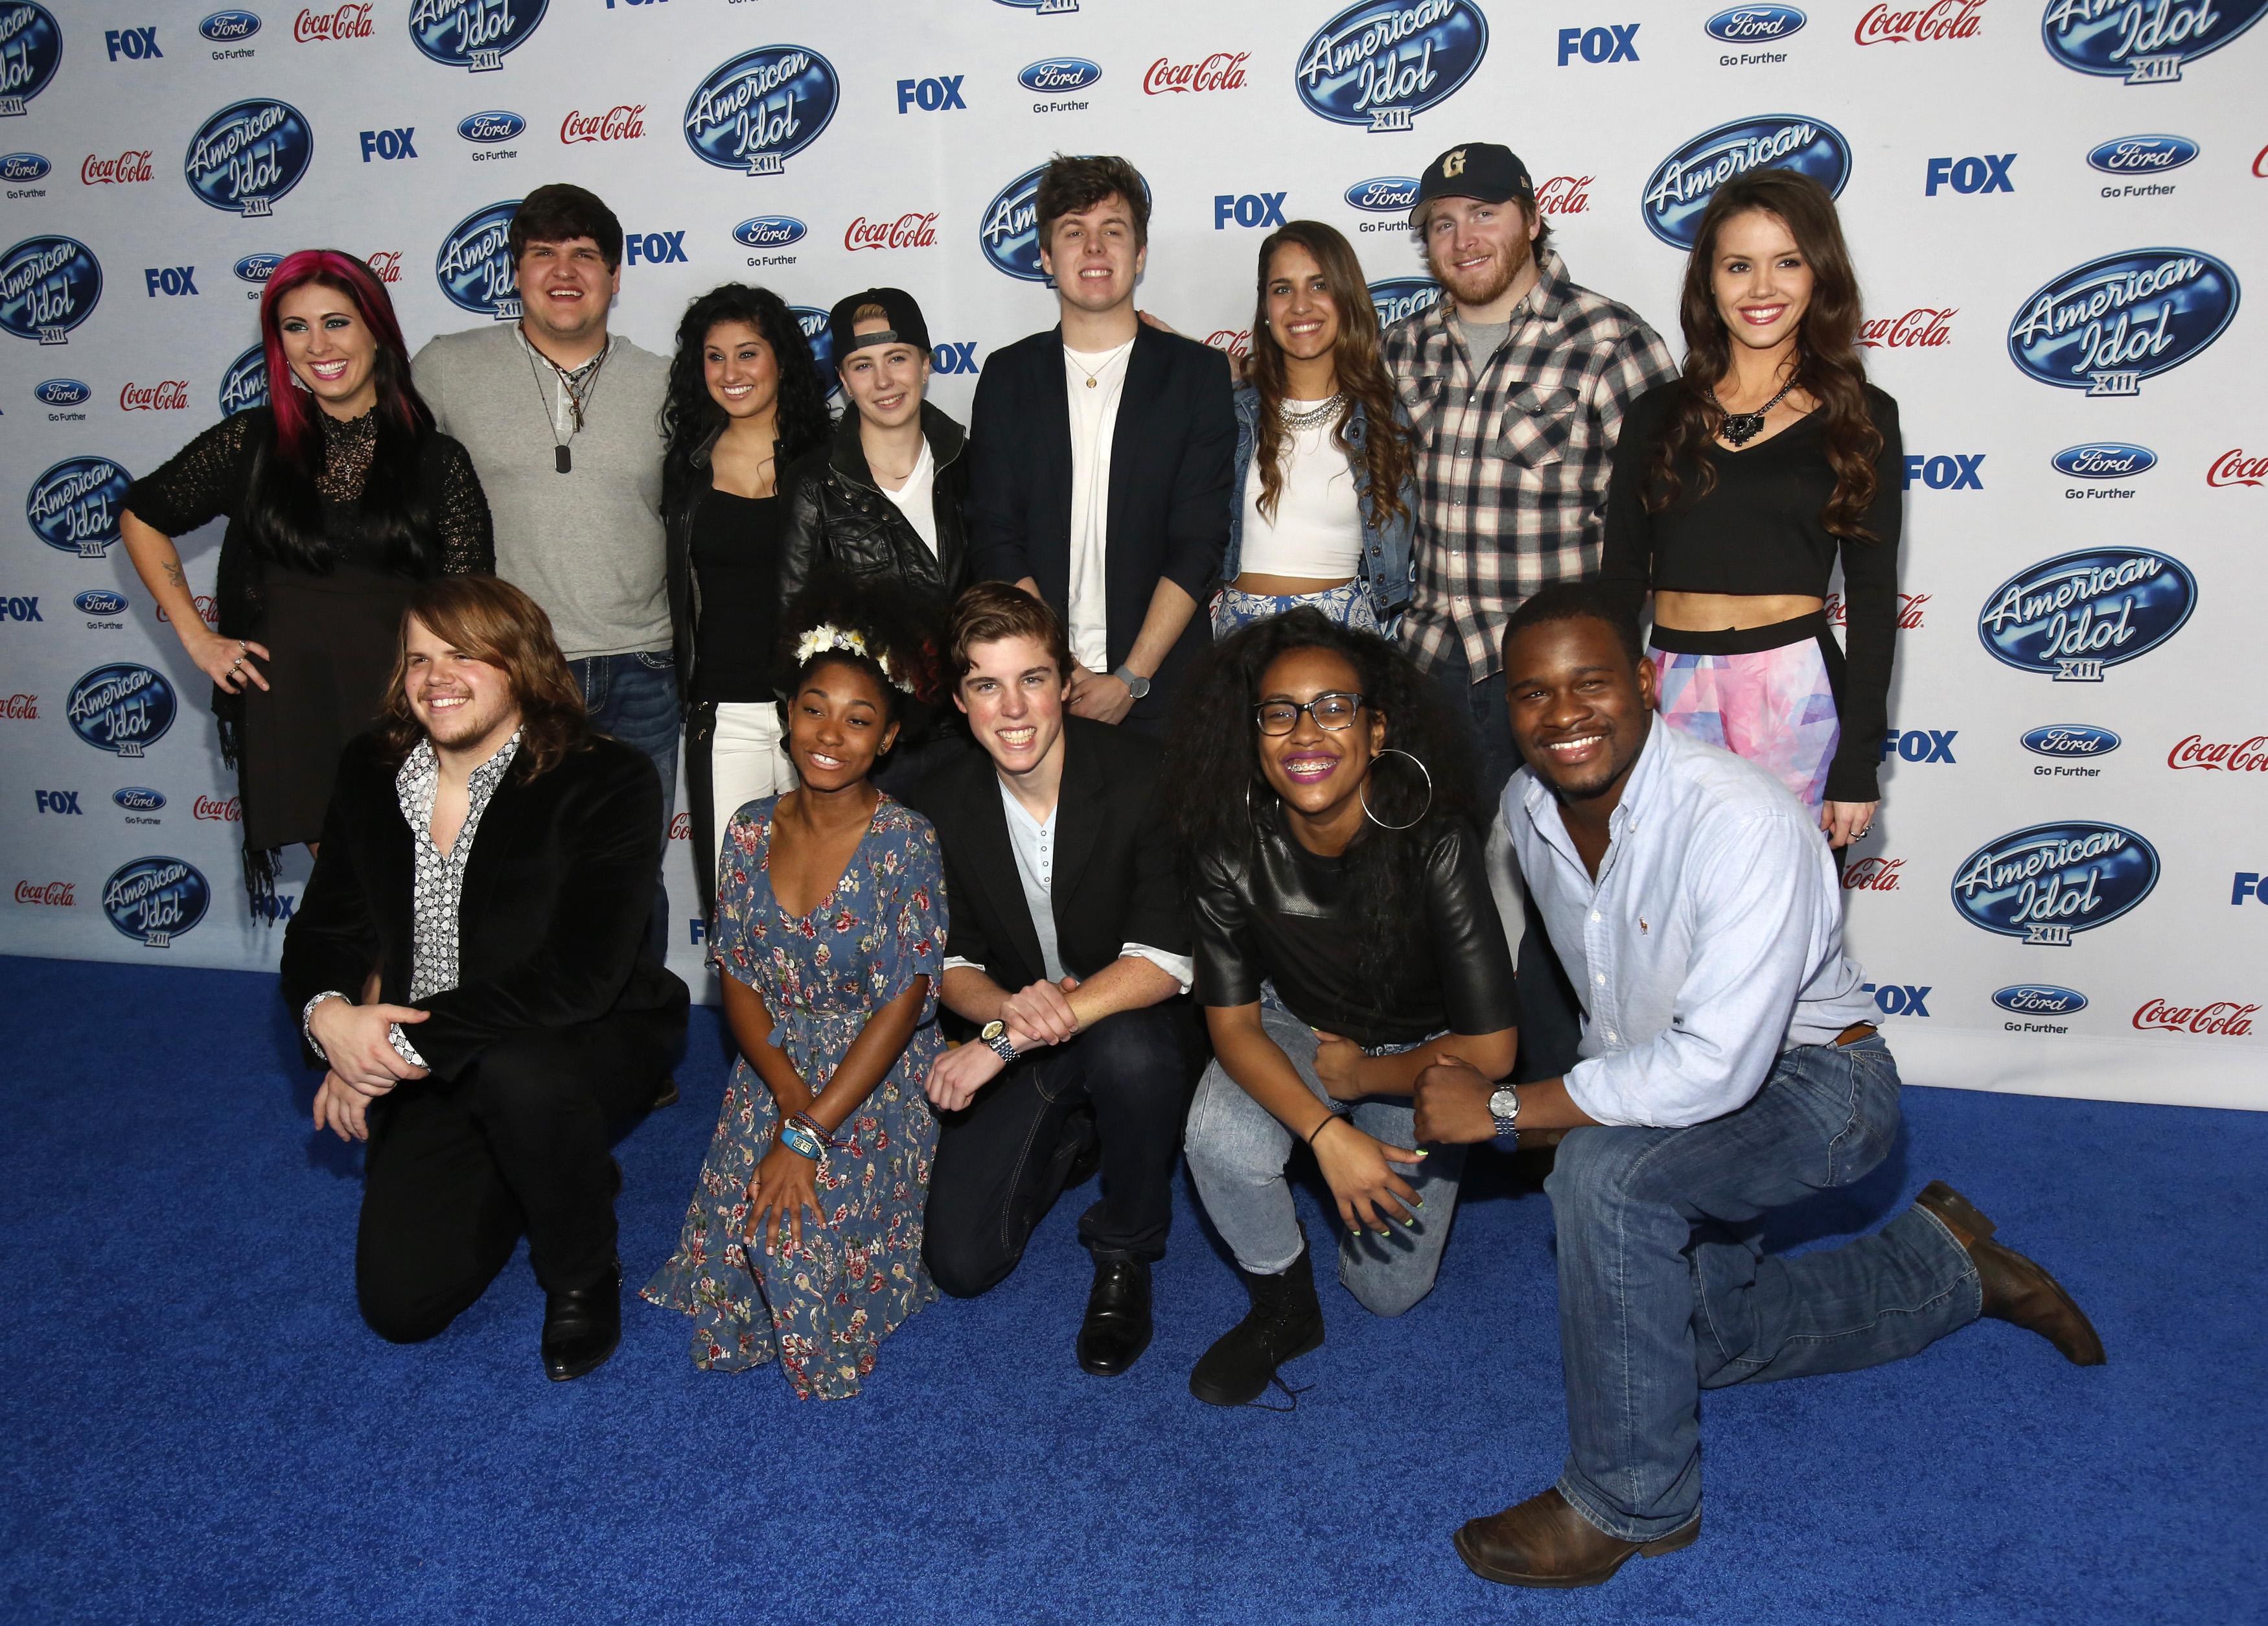 American Idol 2014 Contestants